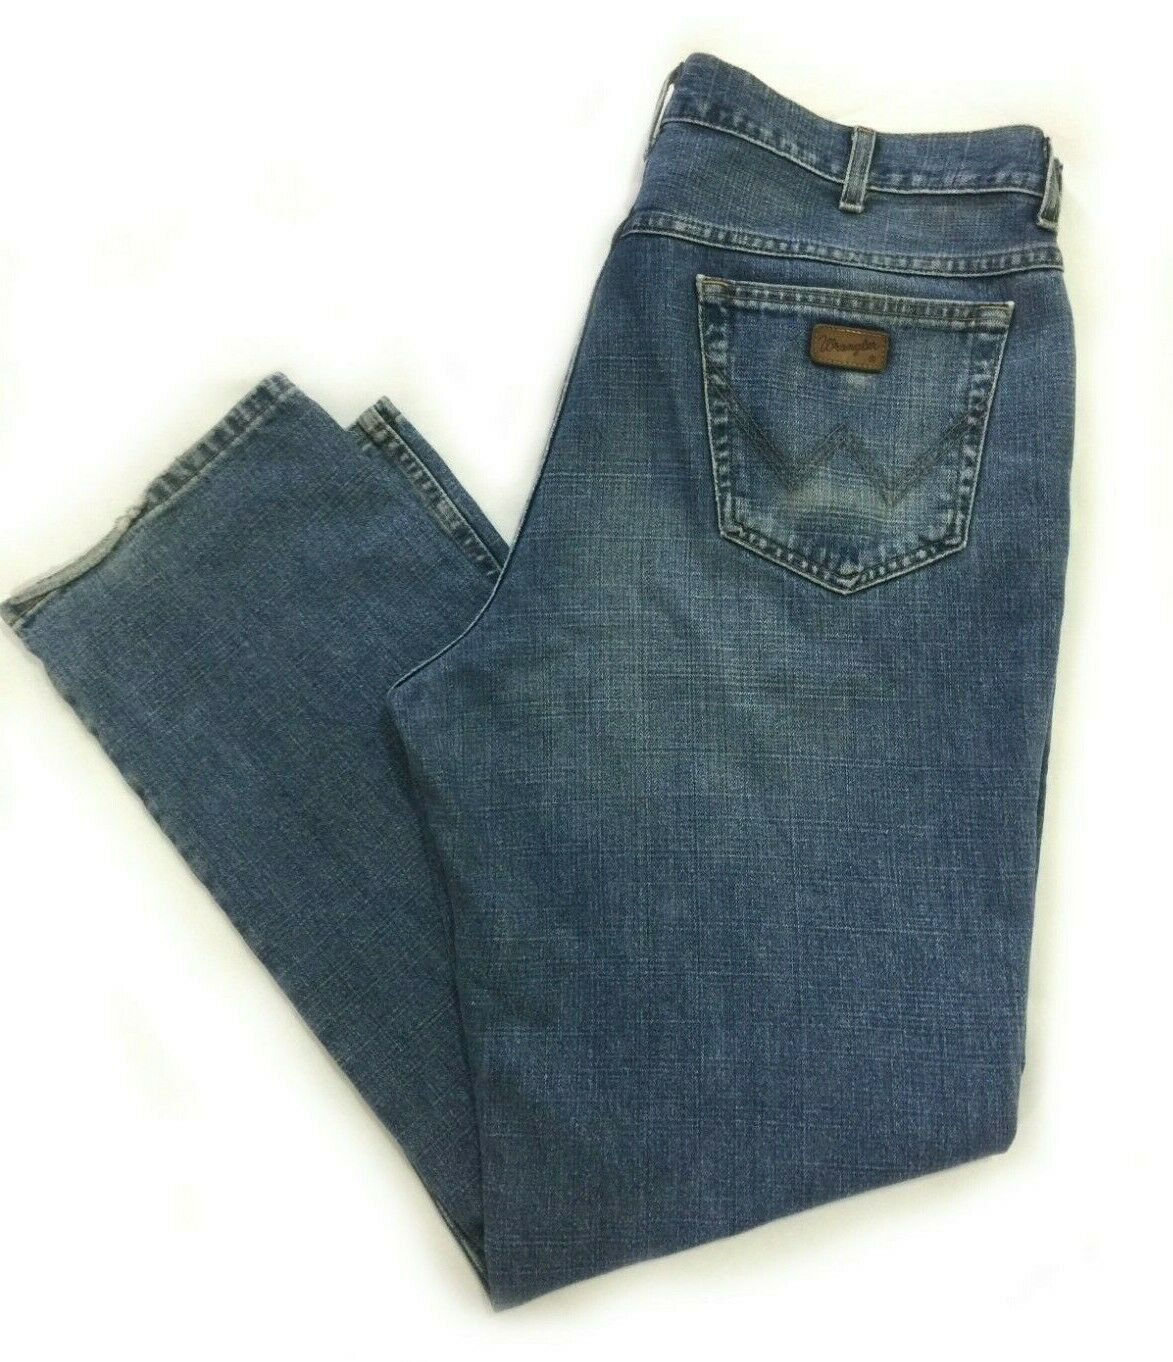 Wrangler Mens Straight Leg Jeans Size W40 L32 Texas bluee Wash Zip Workwear Work